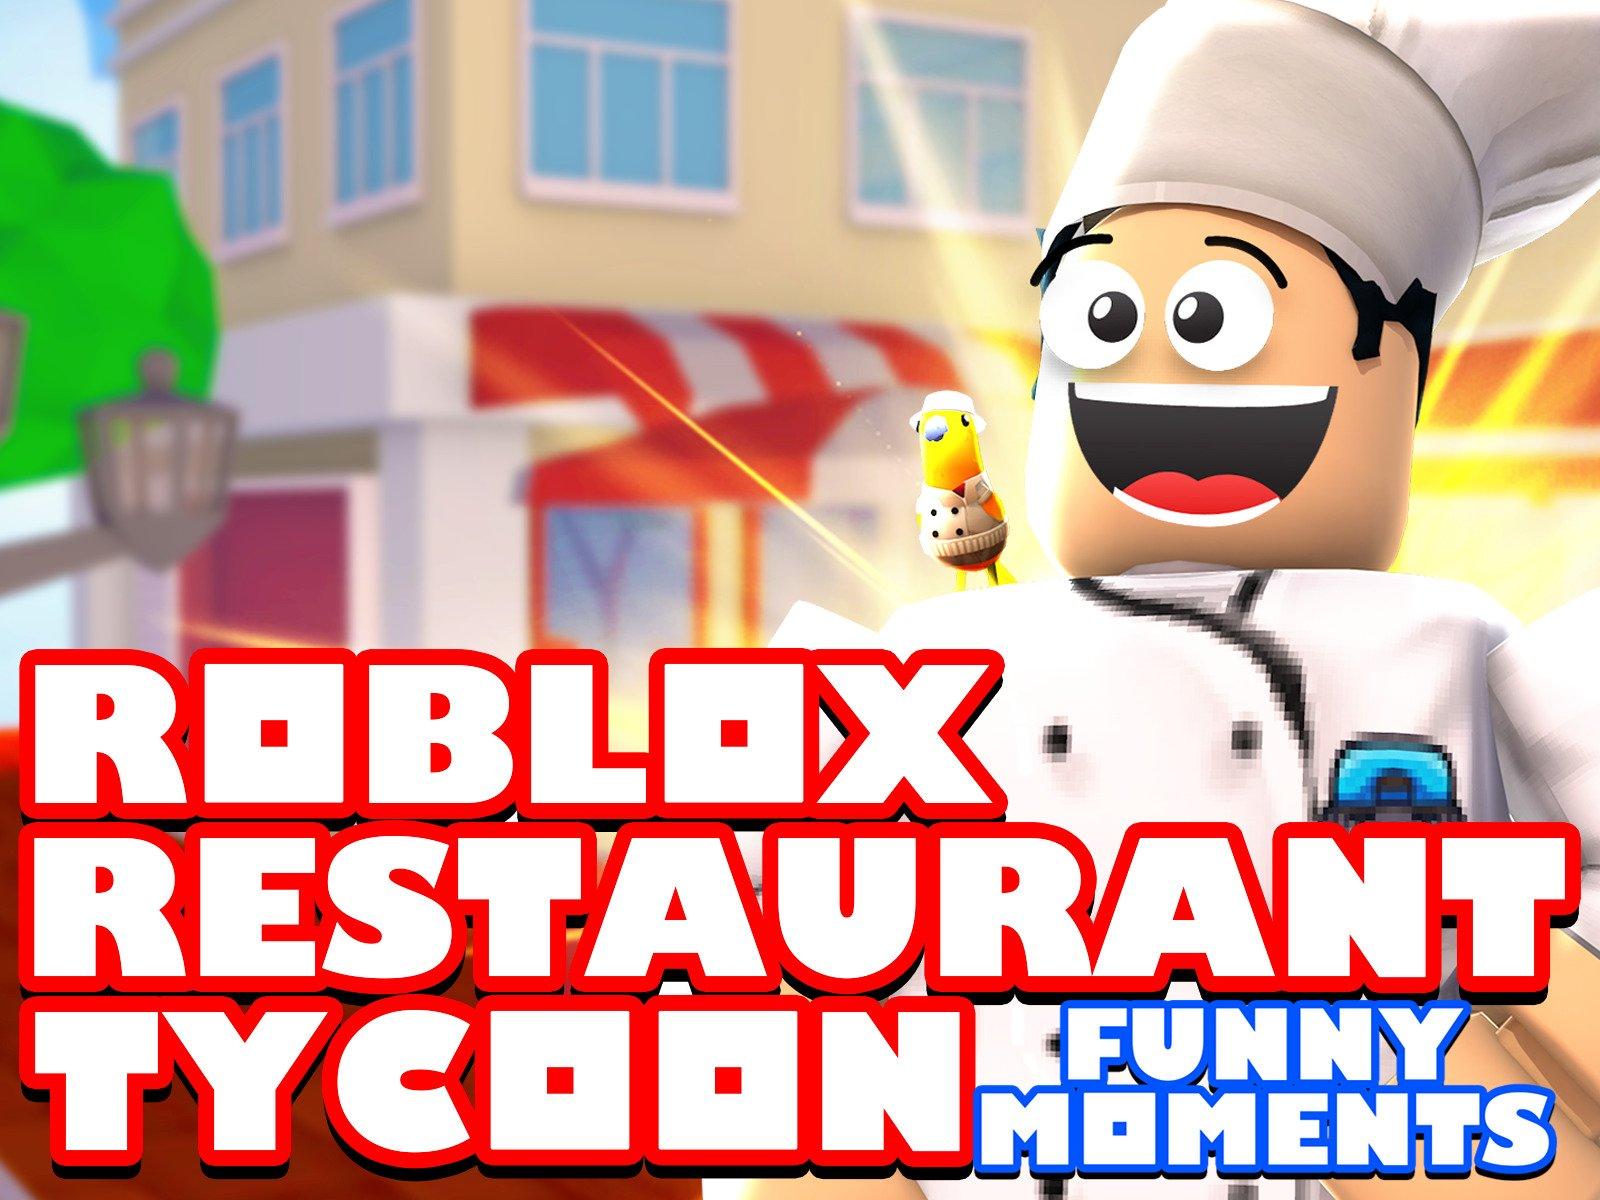 Restaurant Tycoon (Funny Moments) on Amazon Prime Video UK